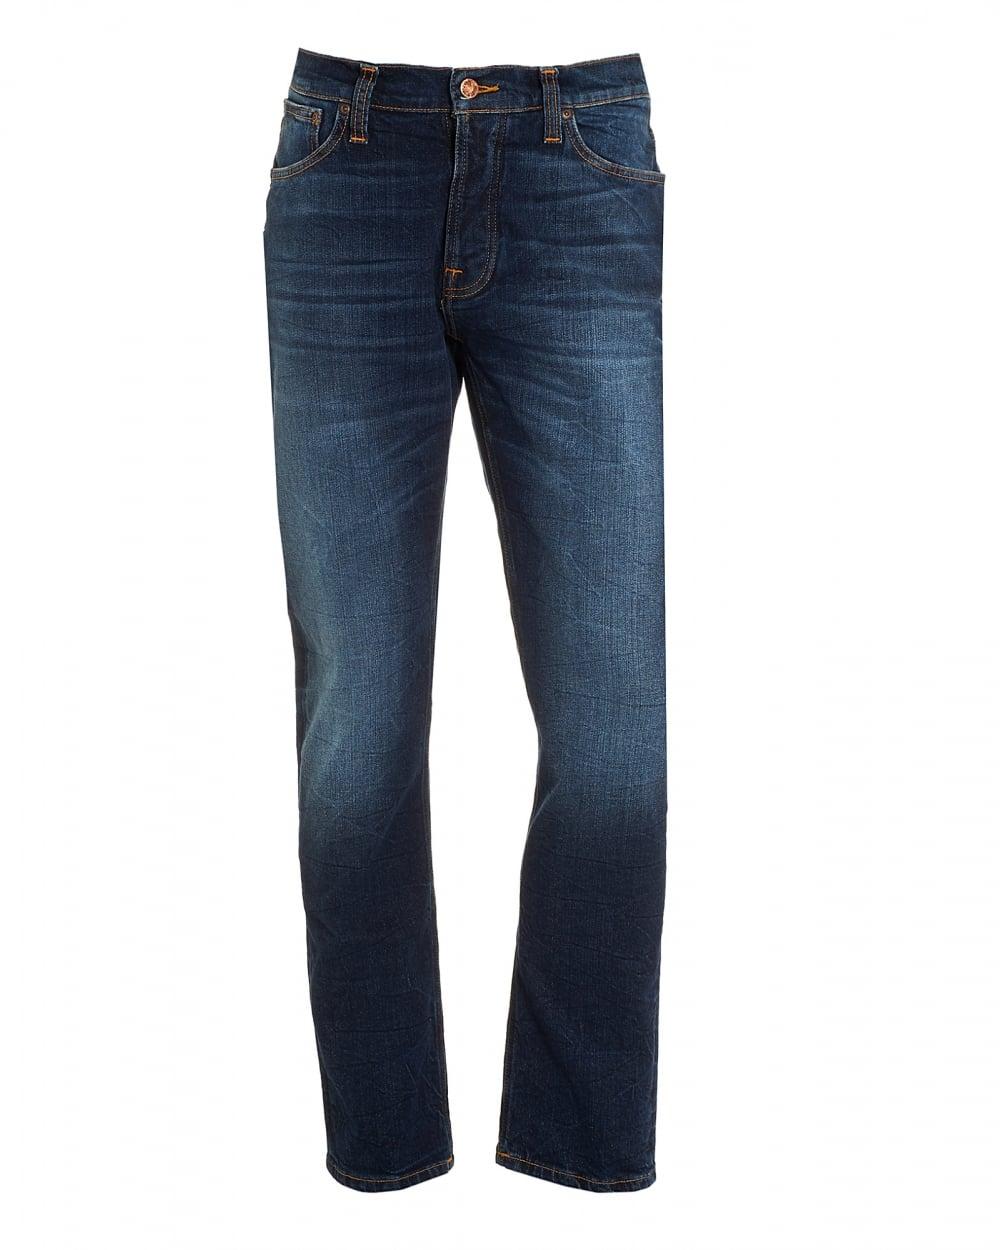 dc8af83ba137e Nudie Jeans Mens Dude Dan Jeans